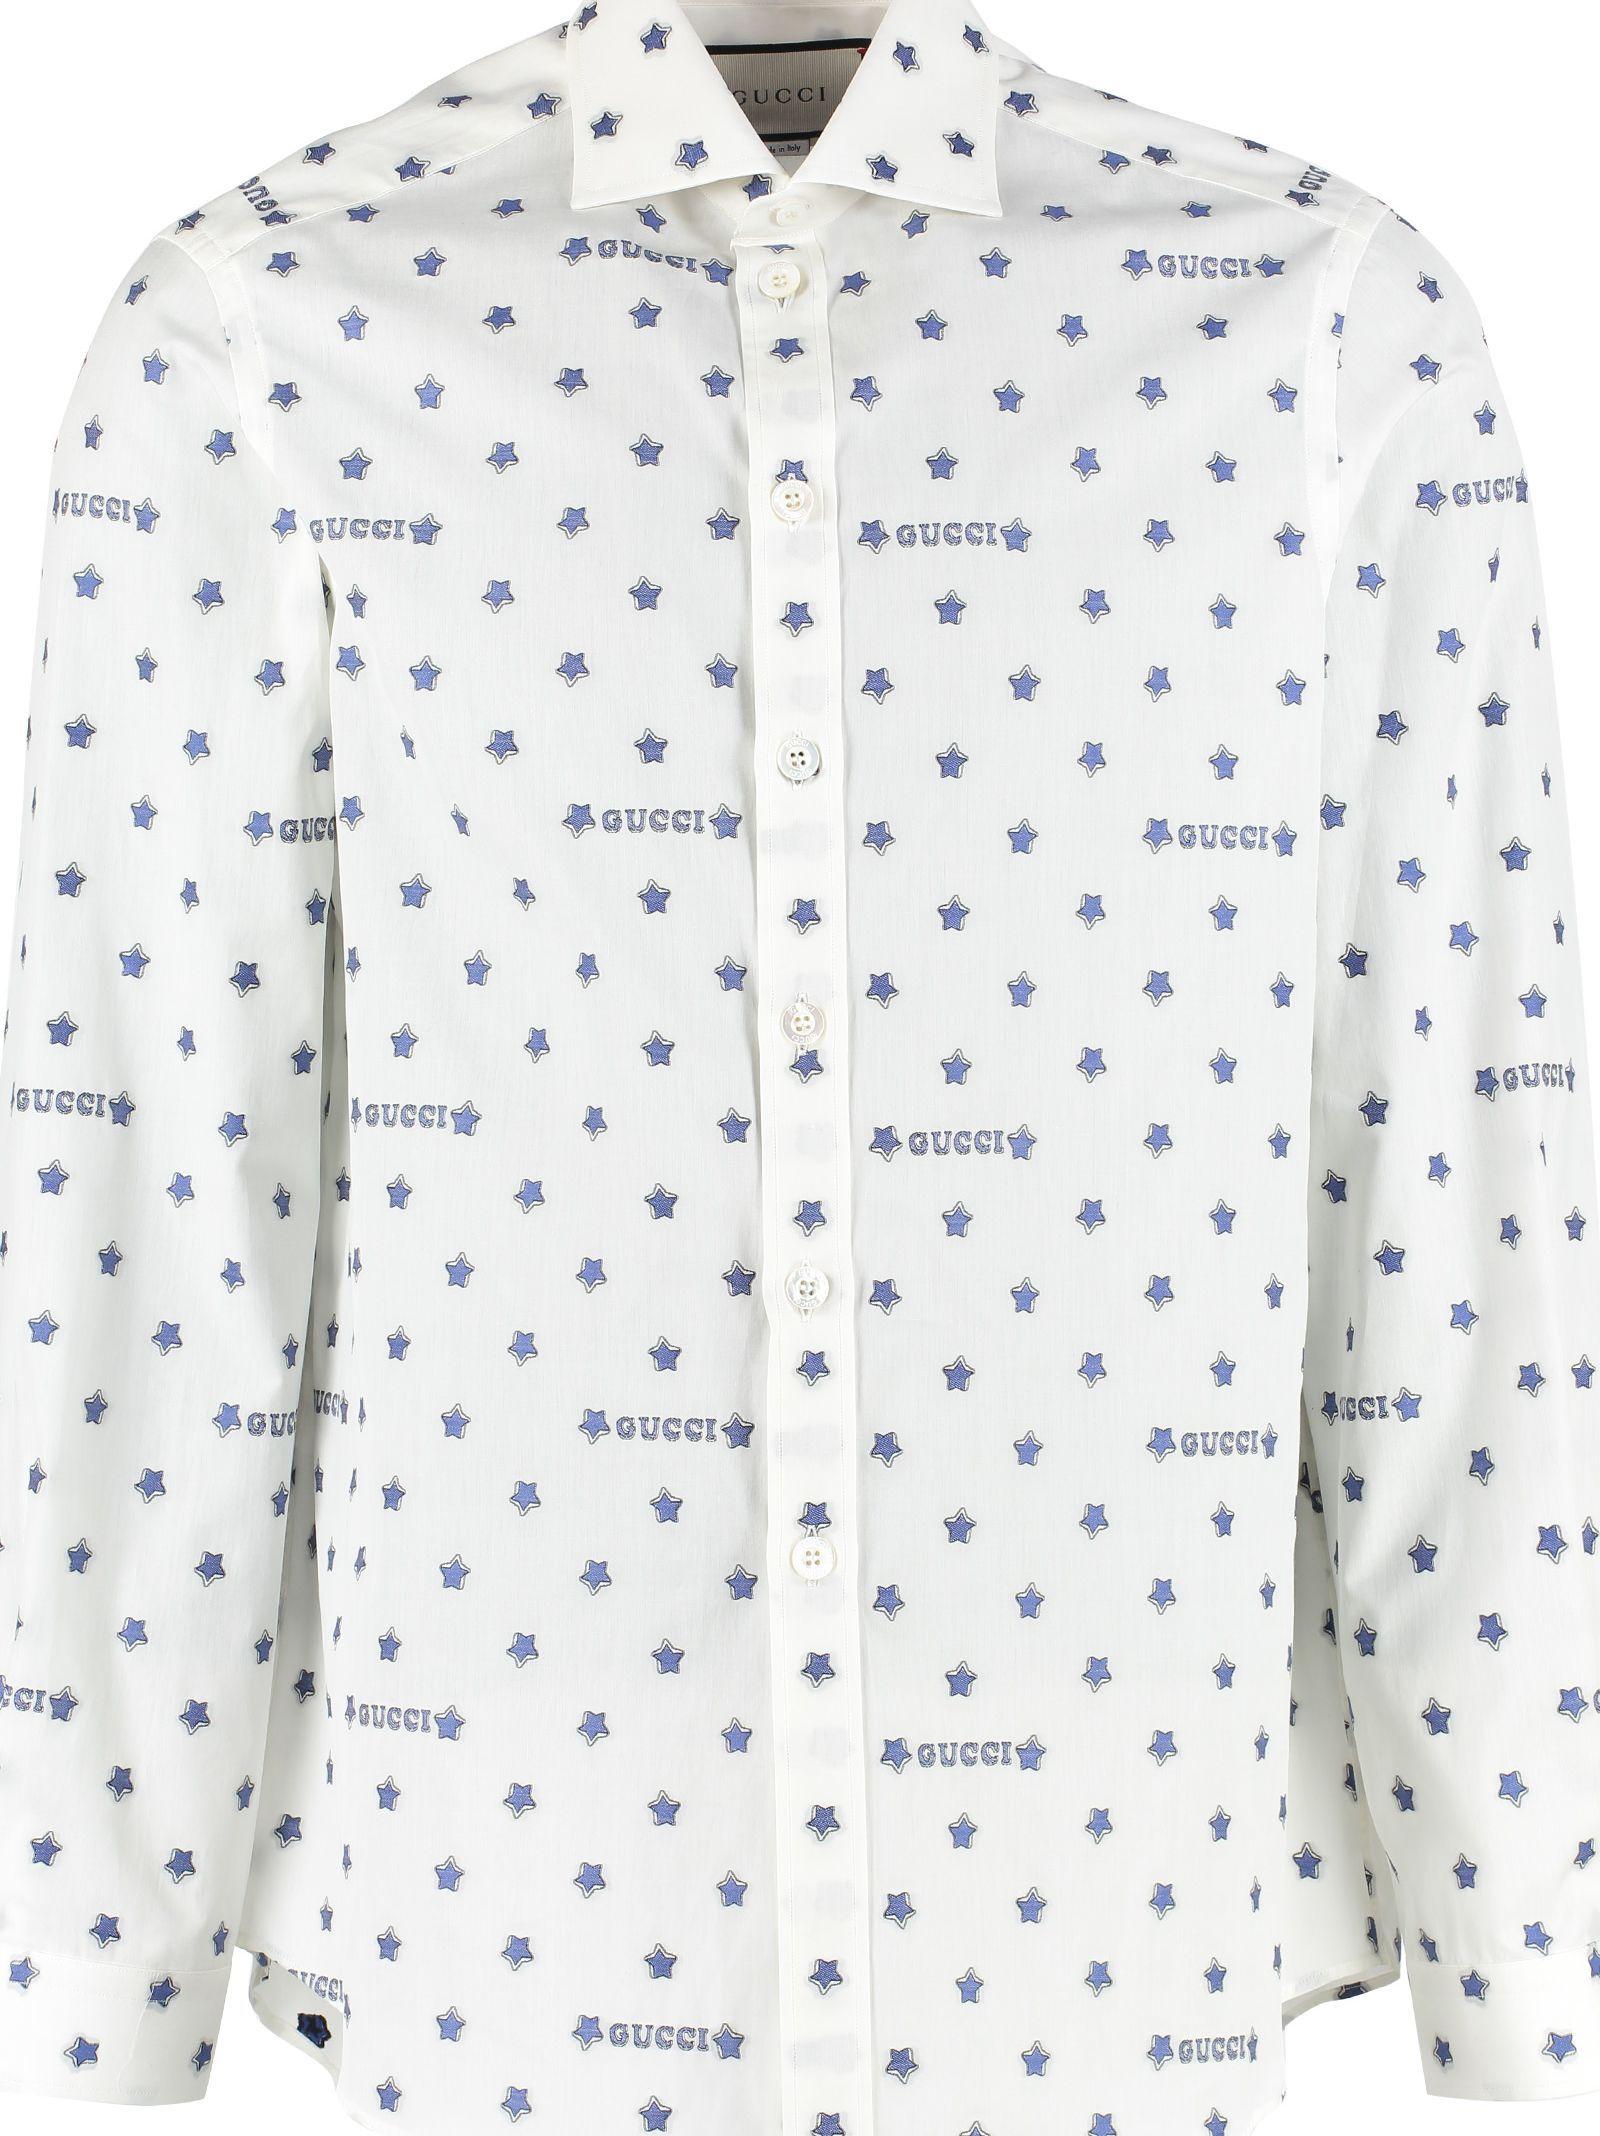 d3899ed714c7 GUCCI STAR AND LOGO PRINT COTTON SHIRT. #gucci #cloth | Gucci in ...